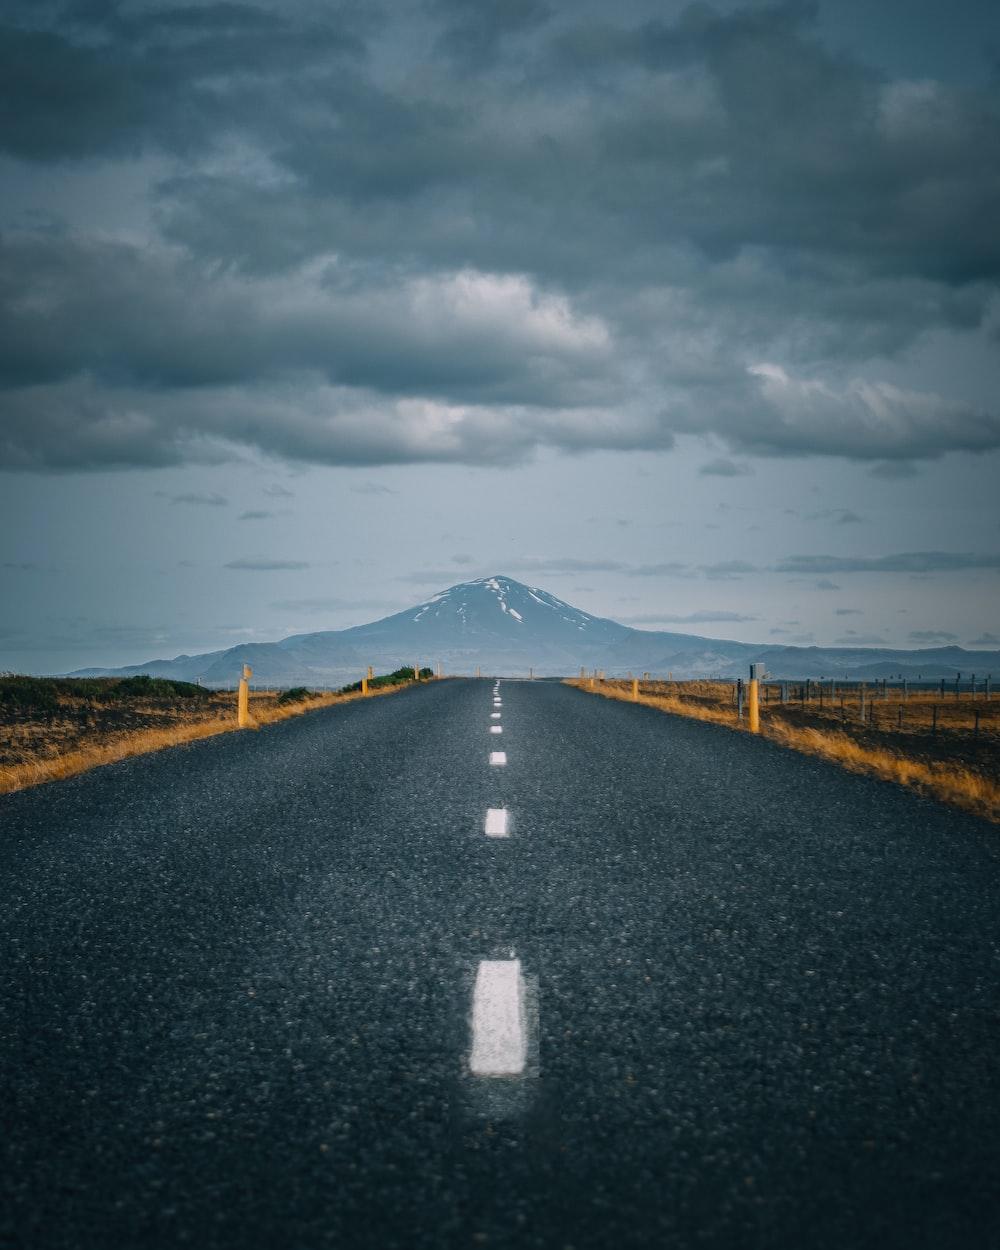 gray asphalt road under gray cloudy sky